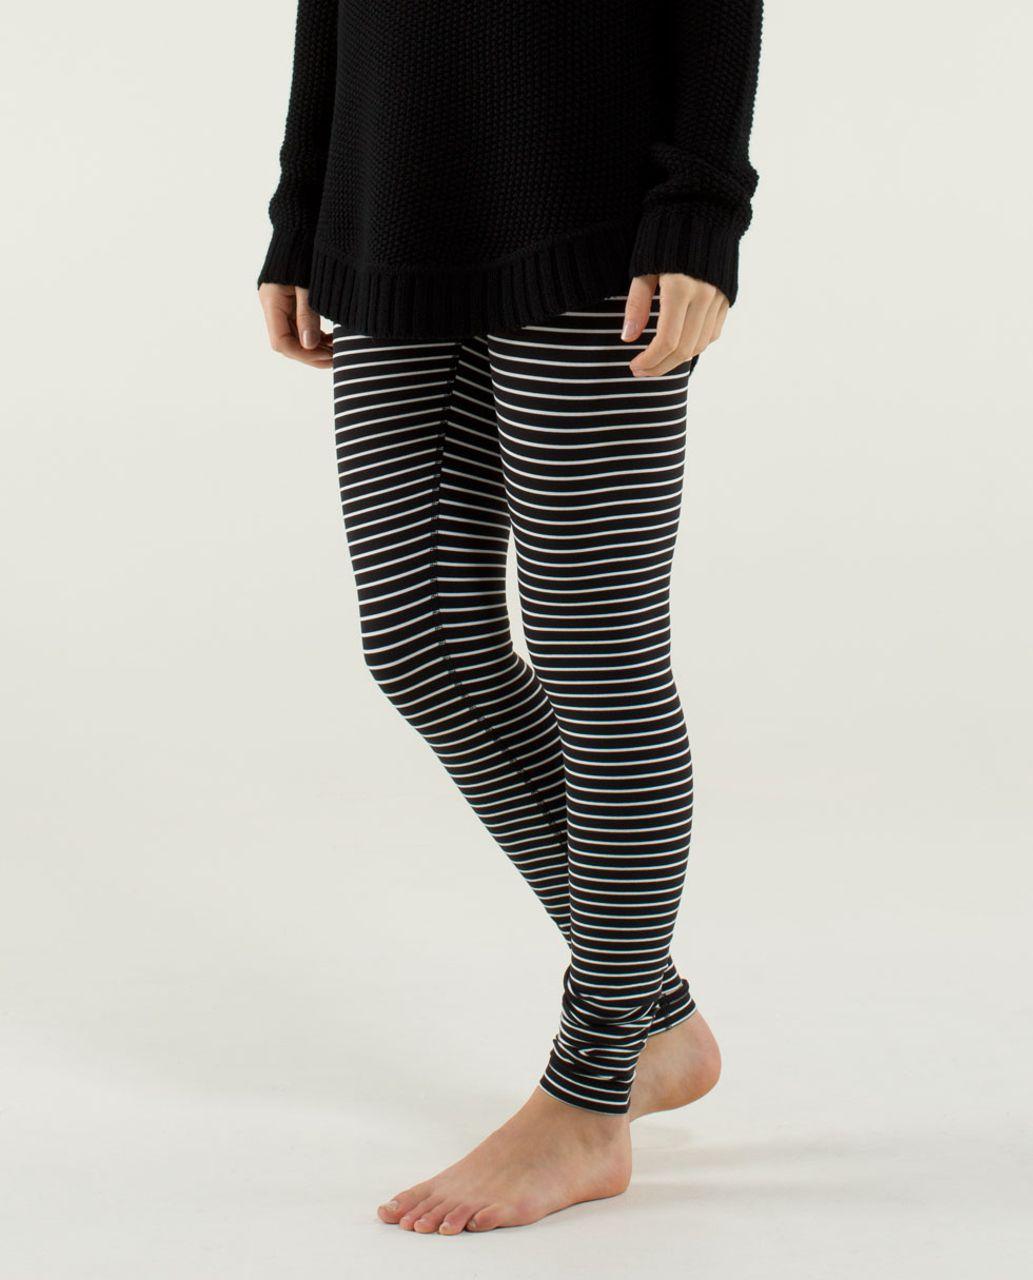 Lululemon Wunder Under Pant - Parallel Stripe Black White / Black